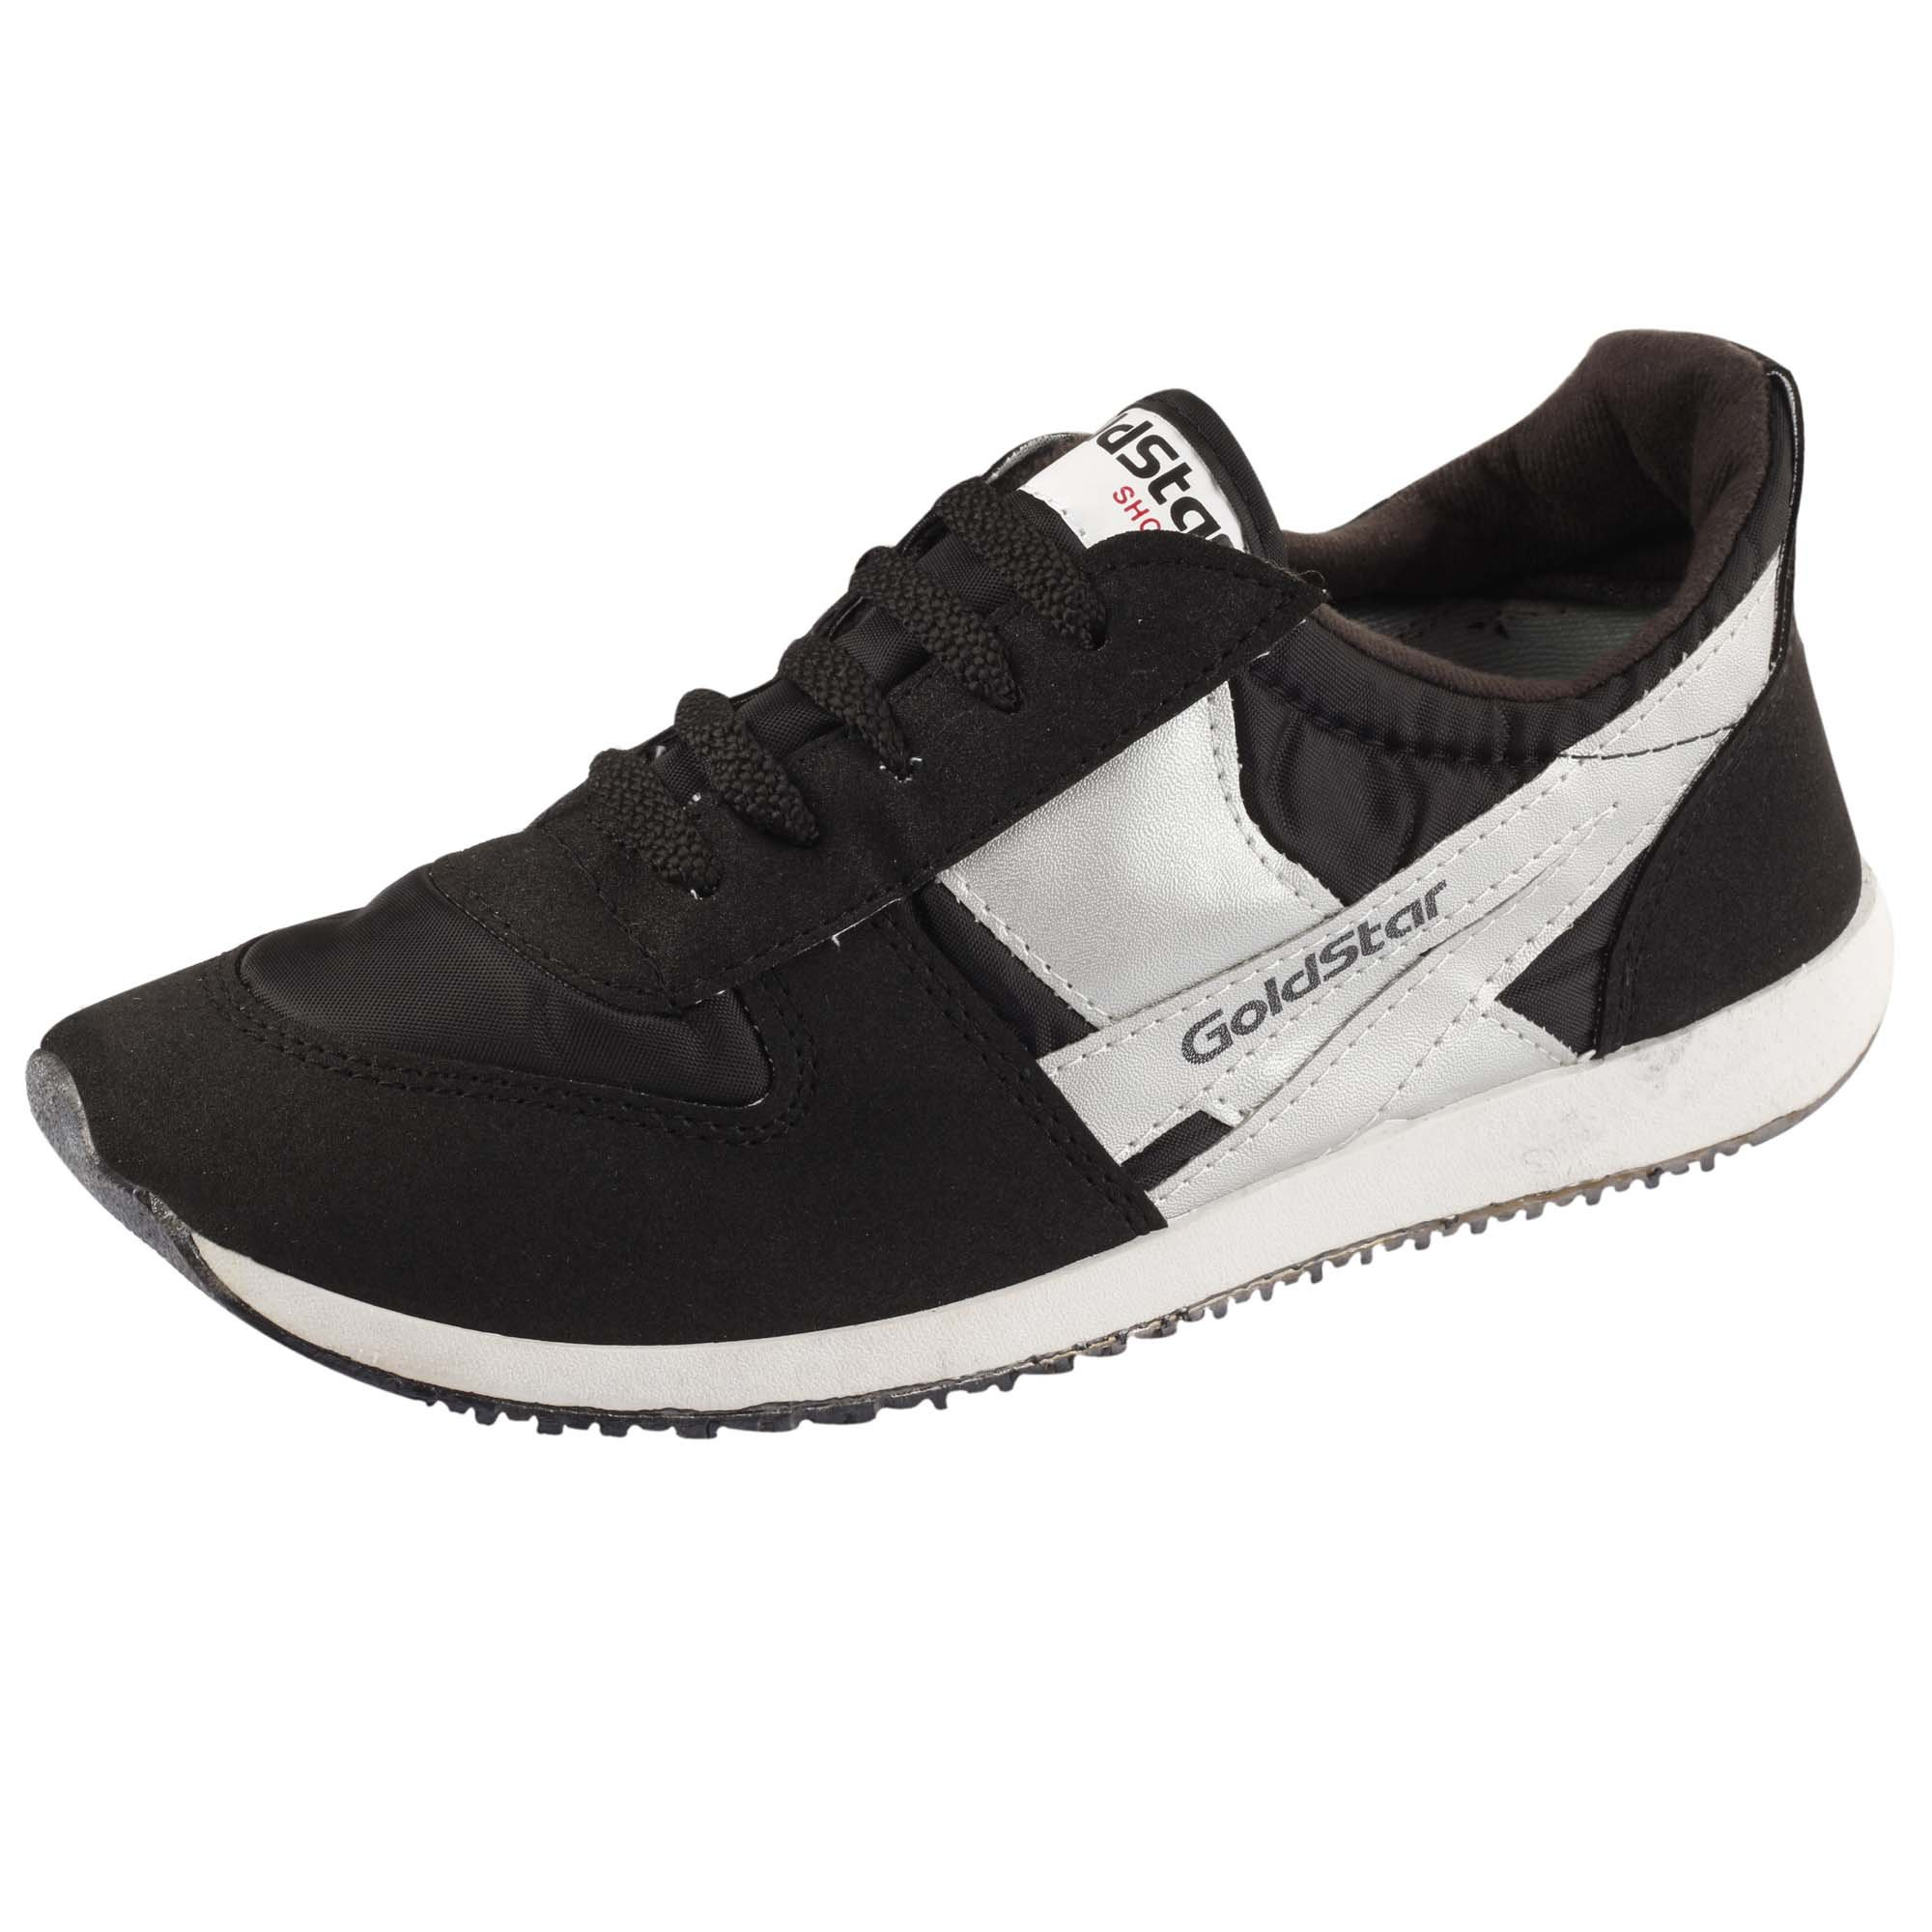 GoldStar Men's Running Shoes- Buy